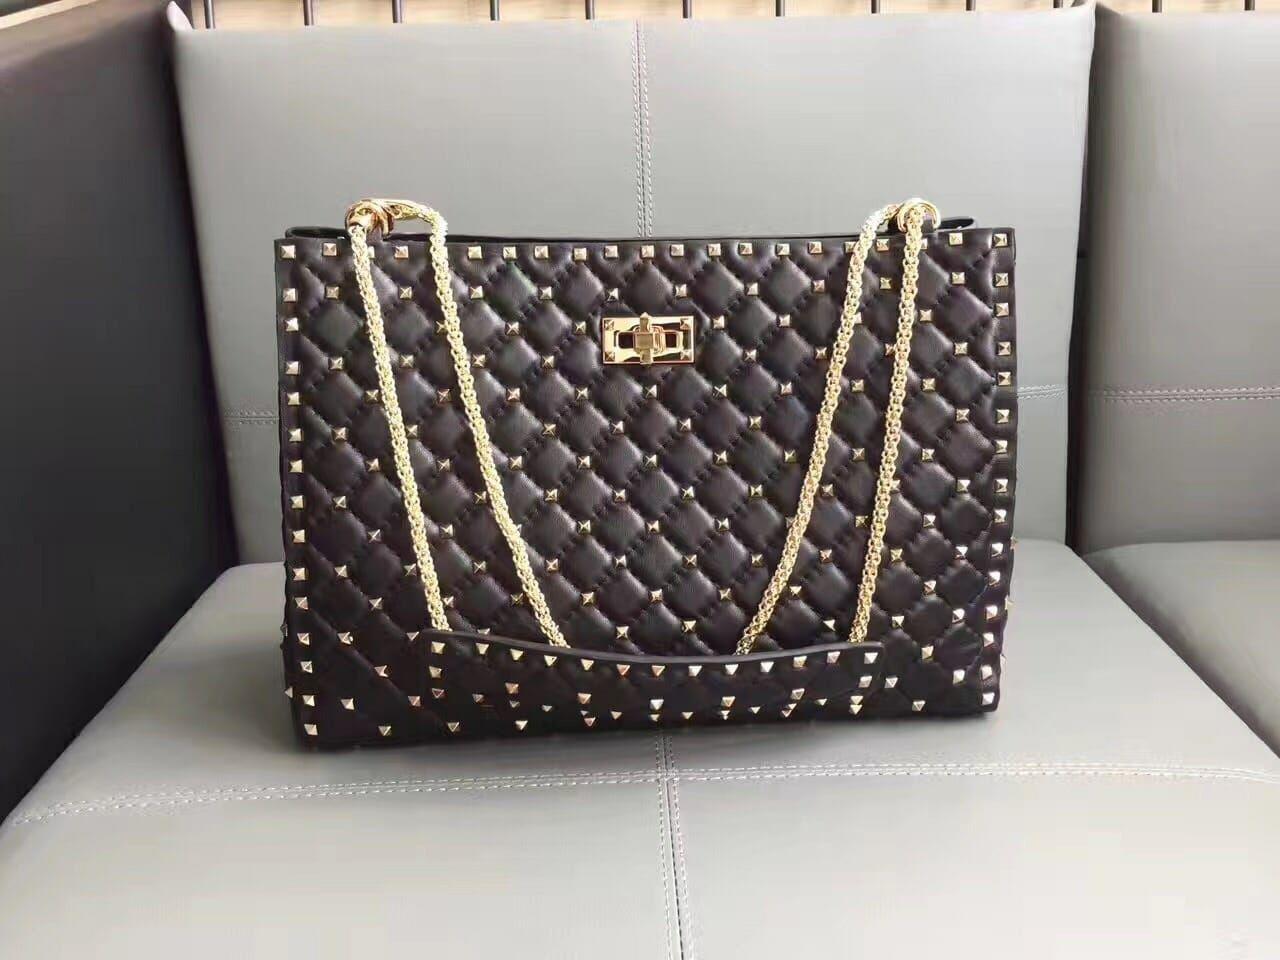 Valentino Starry Series Shopping Bag Original Sheepskin Leather 0346 Black